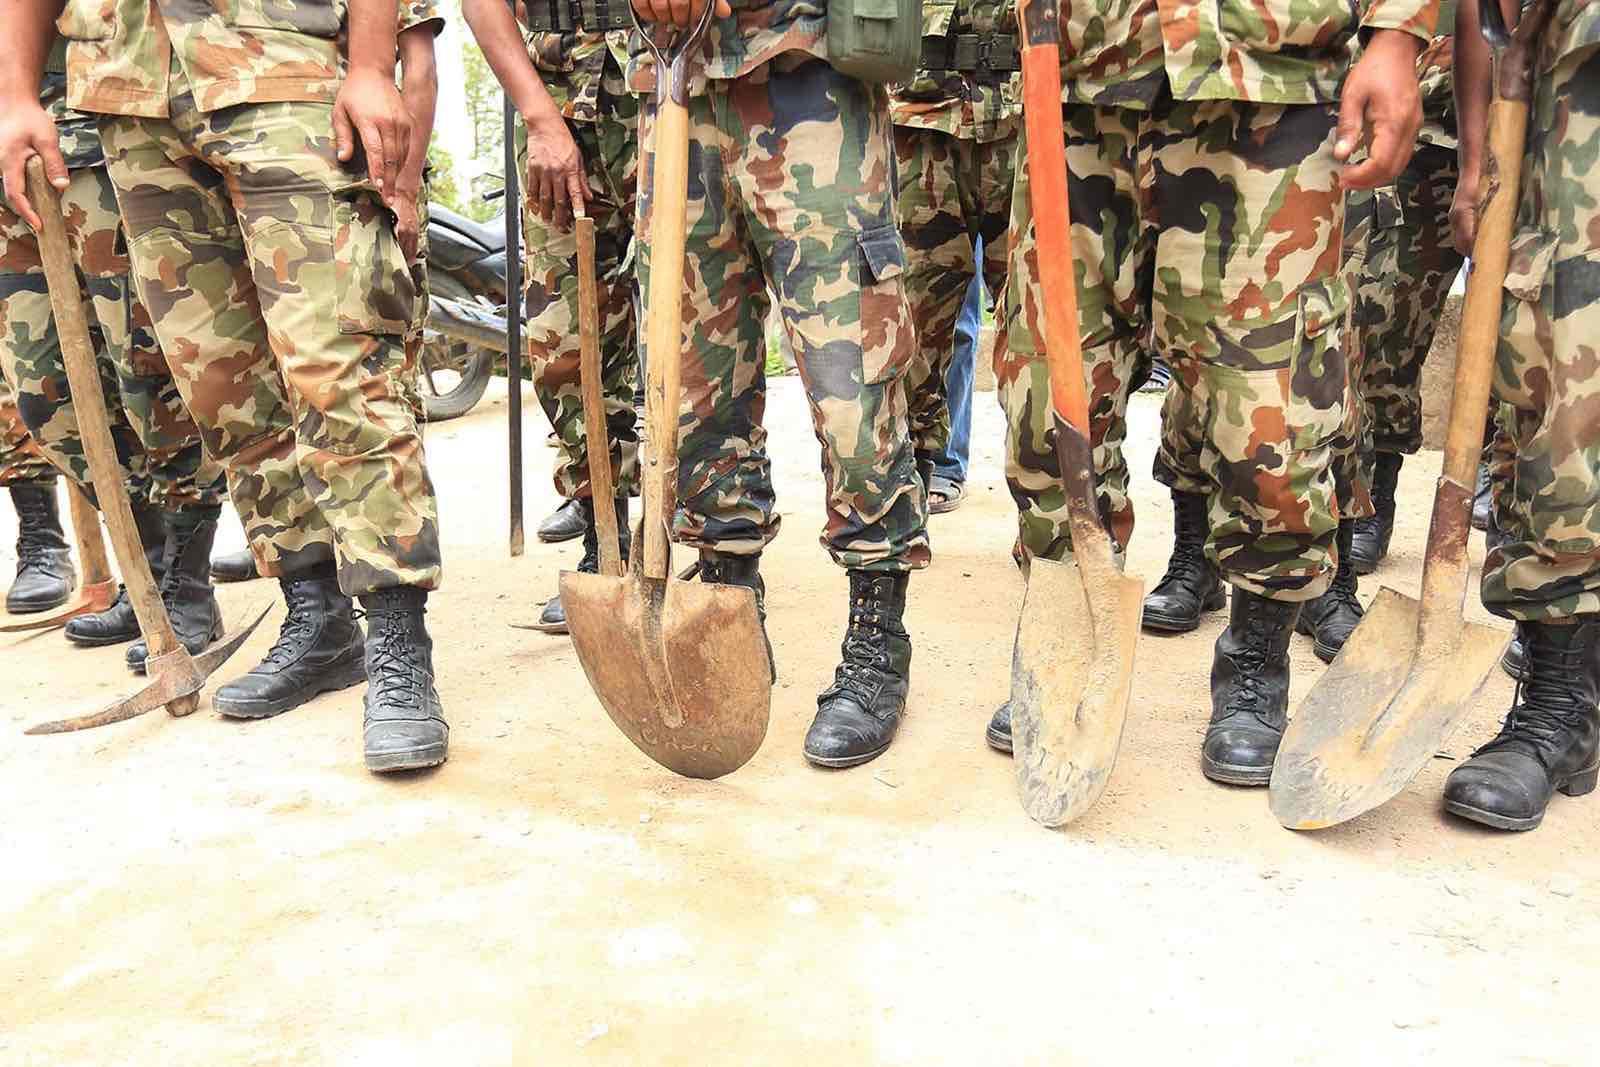 Soldiers responding to the 2015 Nepal earthquake (Laxmi Prasad Ngakhusi/UNDP Nepal)